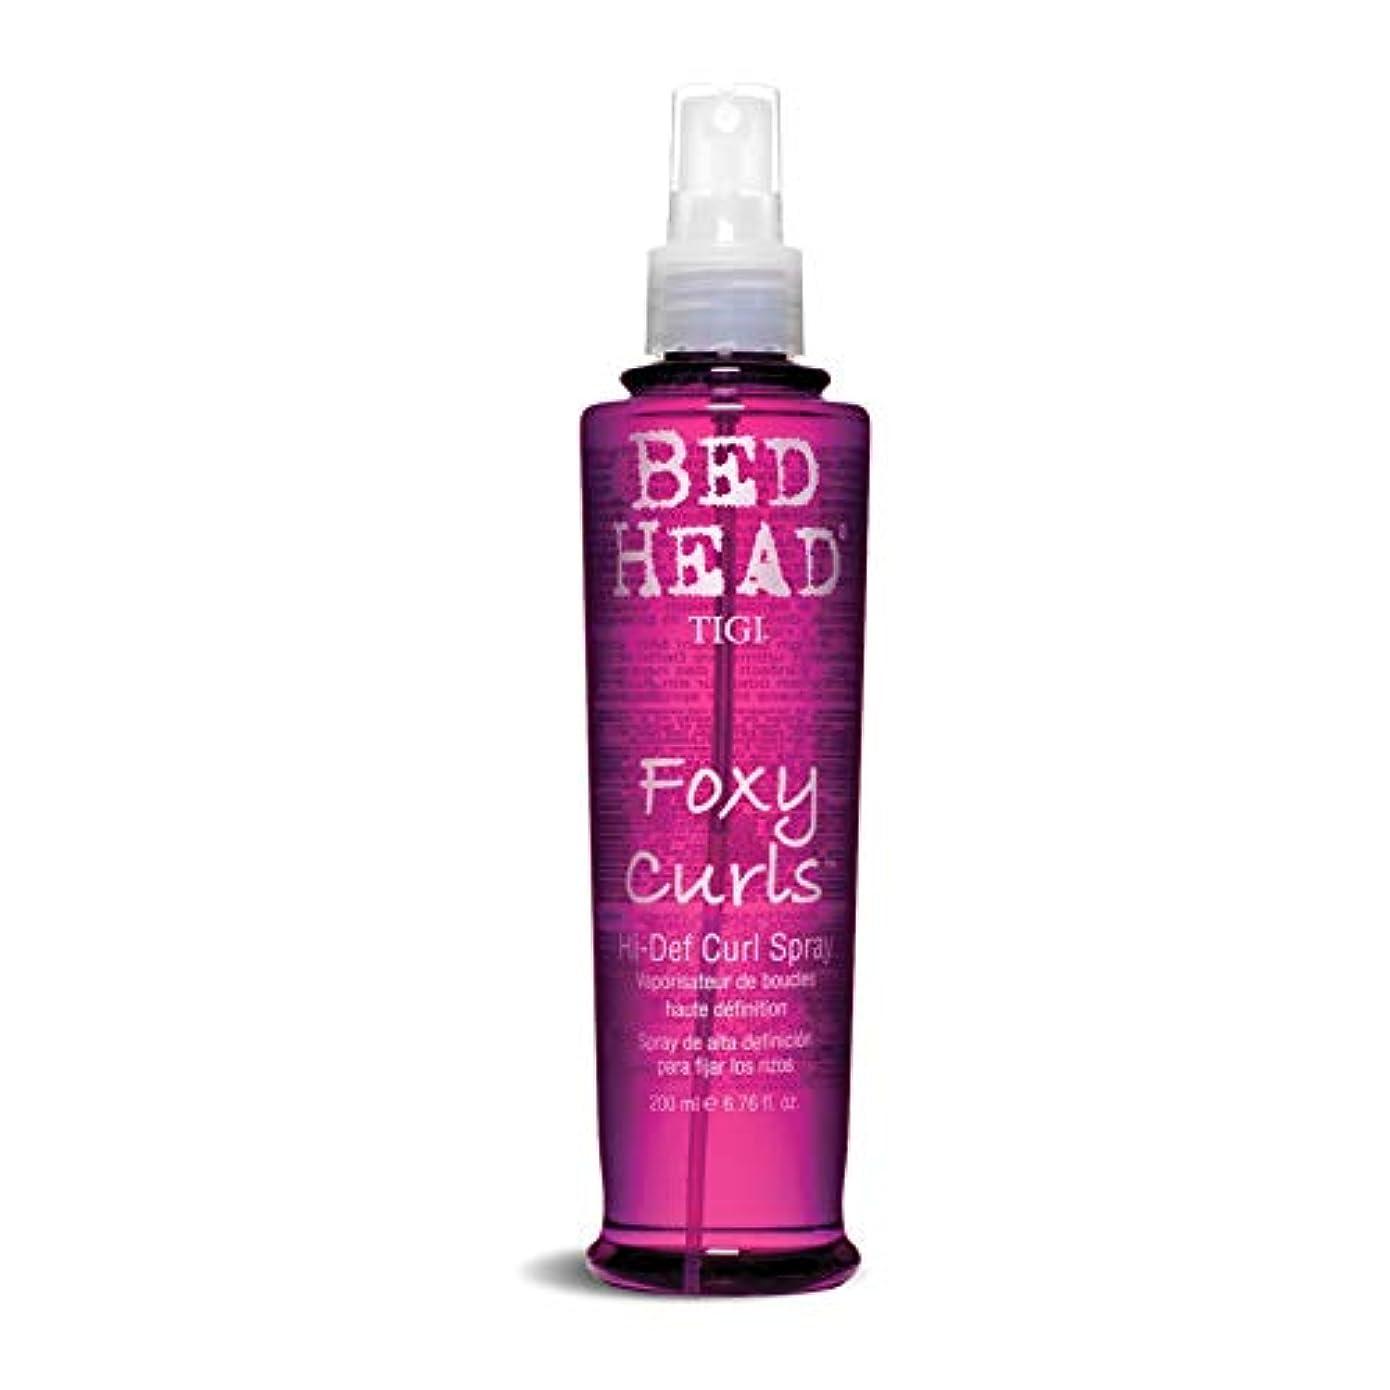 TIGI Bed Head Foxy Curls Hi-Def Curl Spray 200ml (並行輸入品)